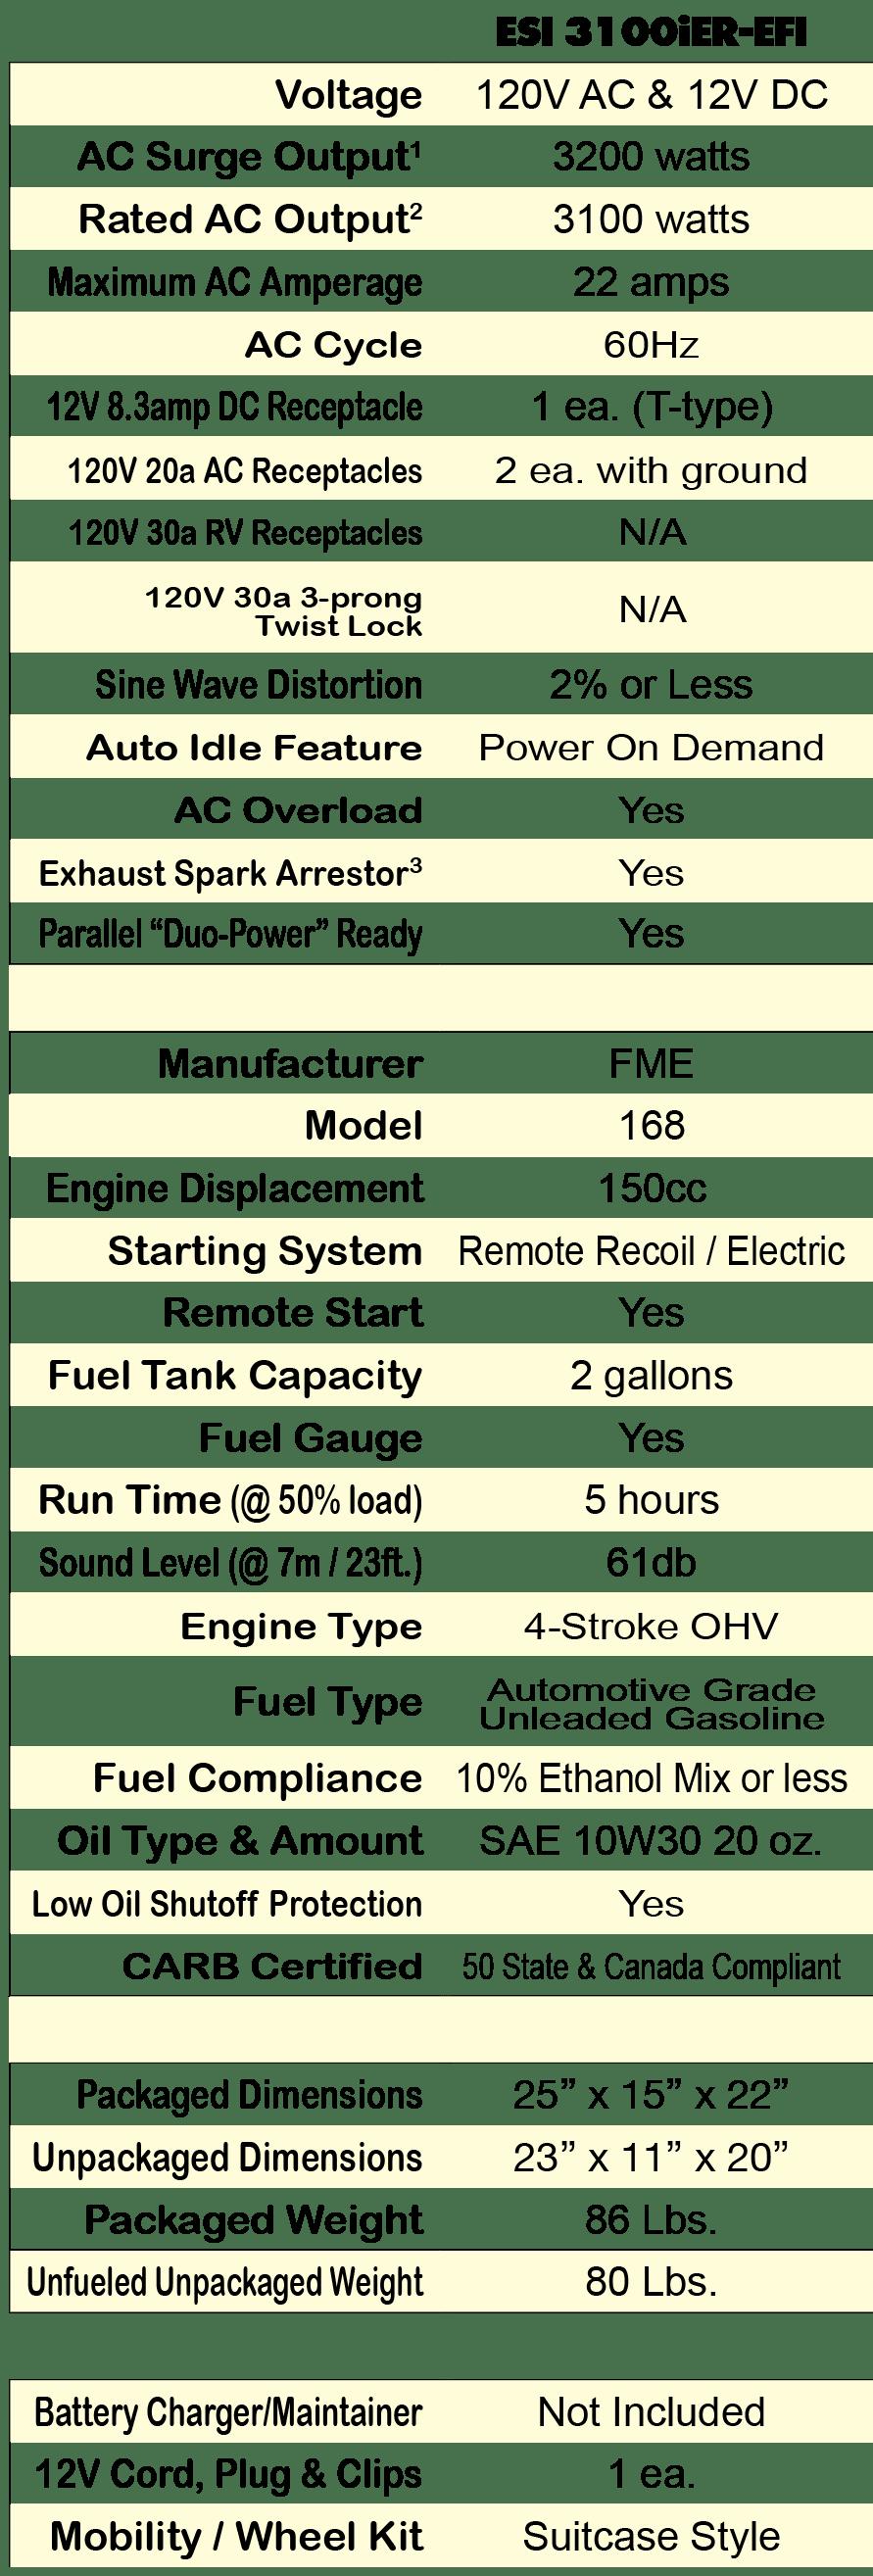 ESI3100iER-EFI